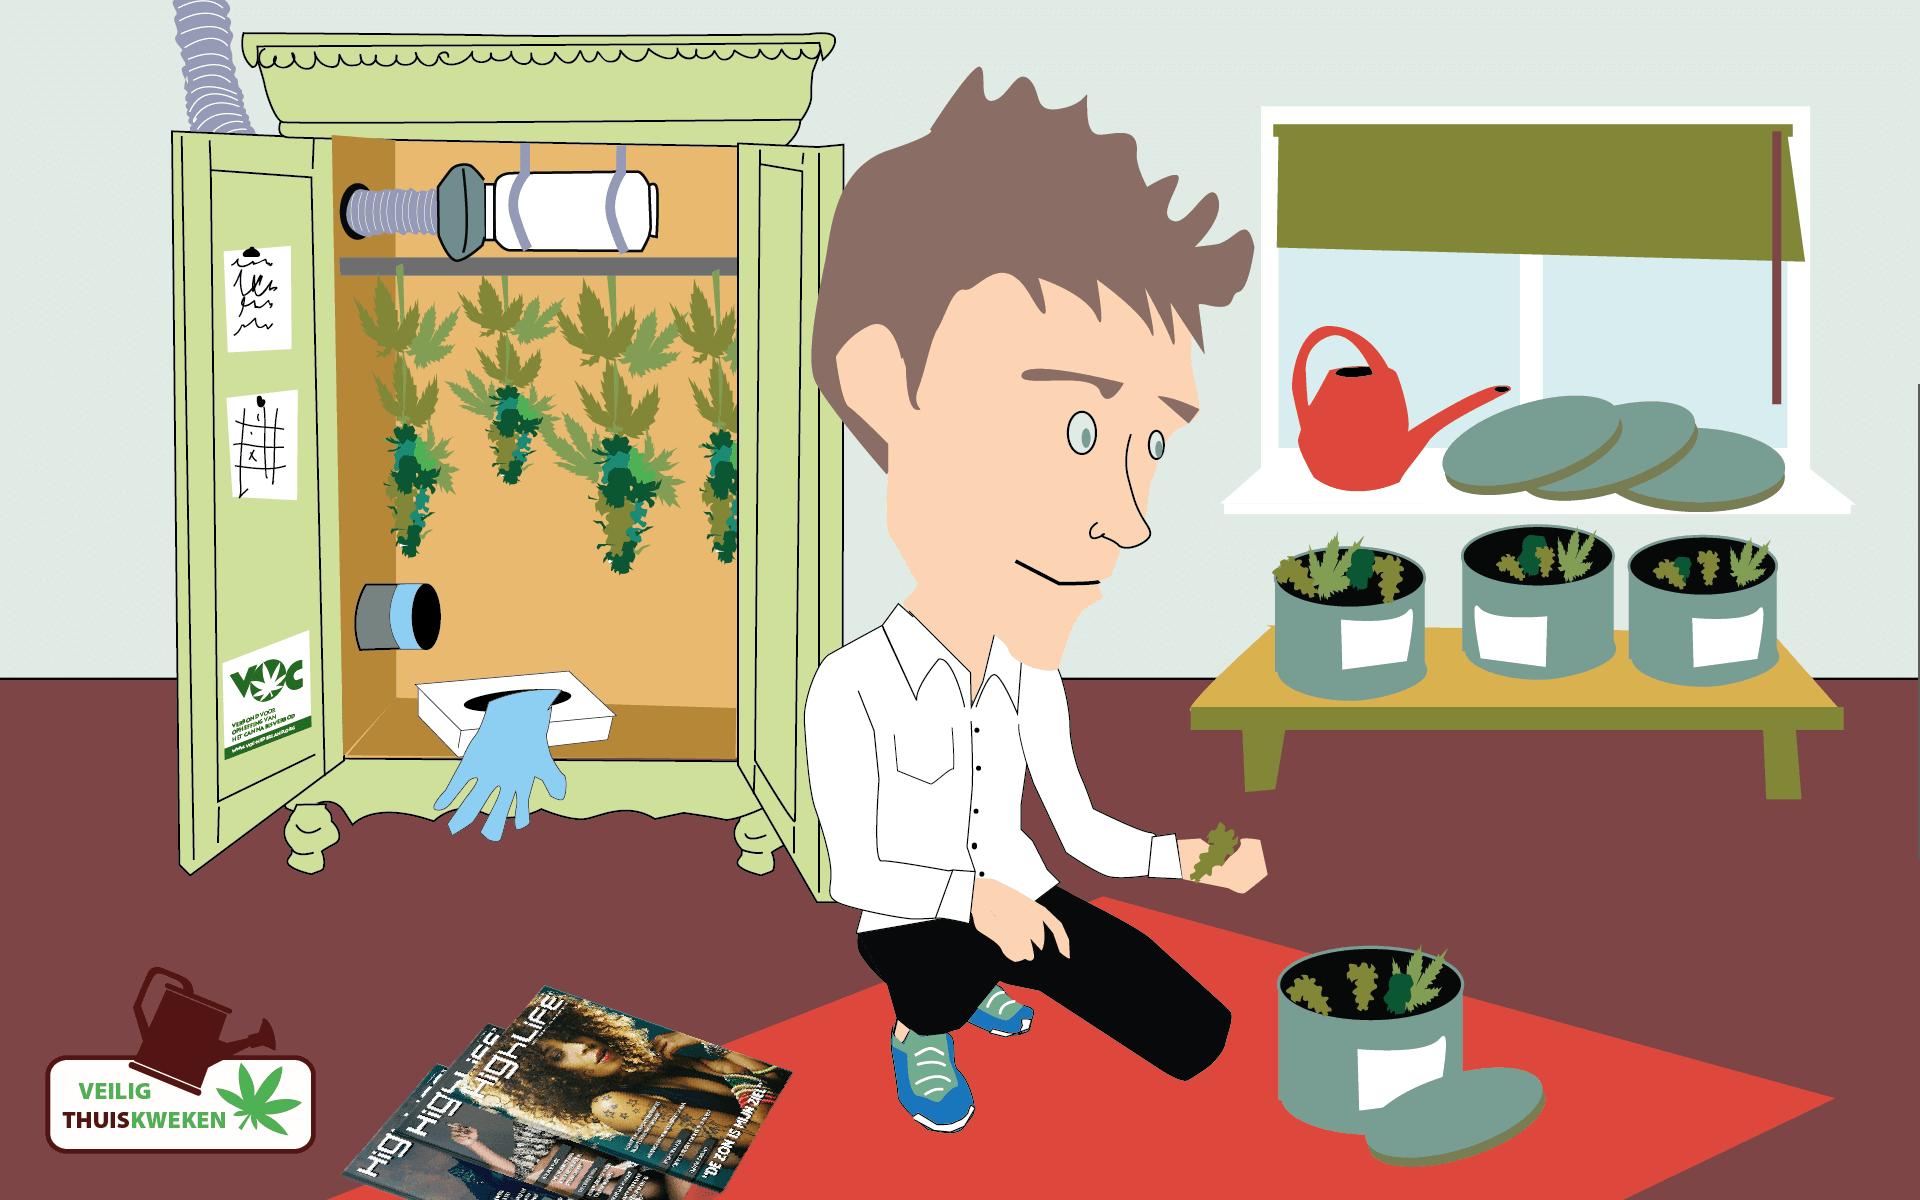 Veilig Thuis Kweken